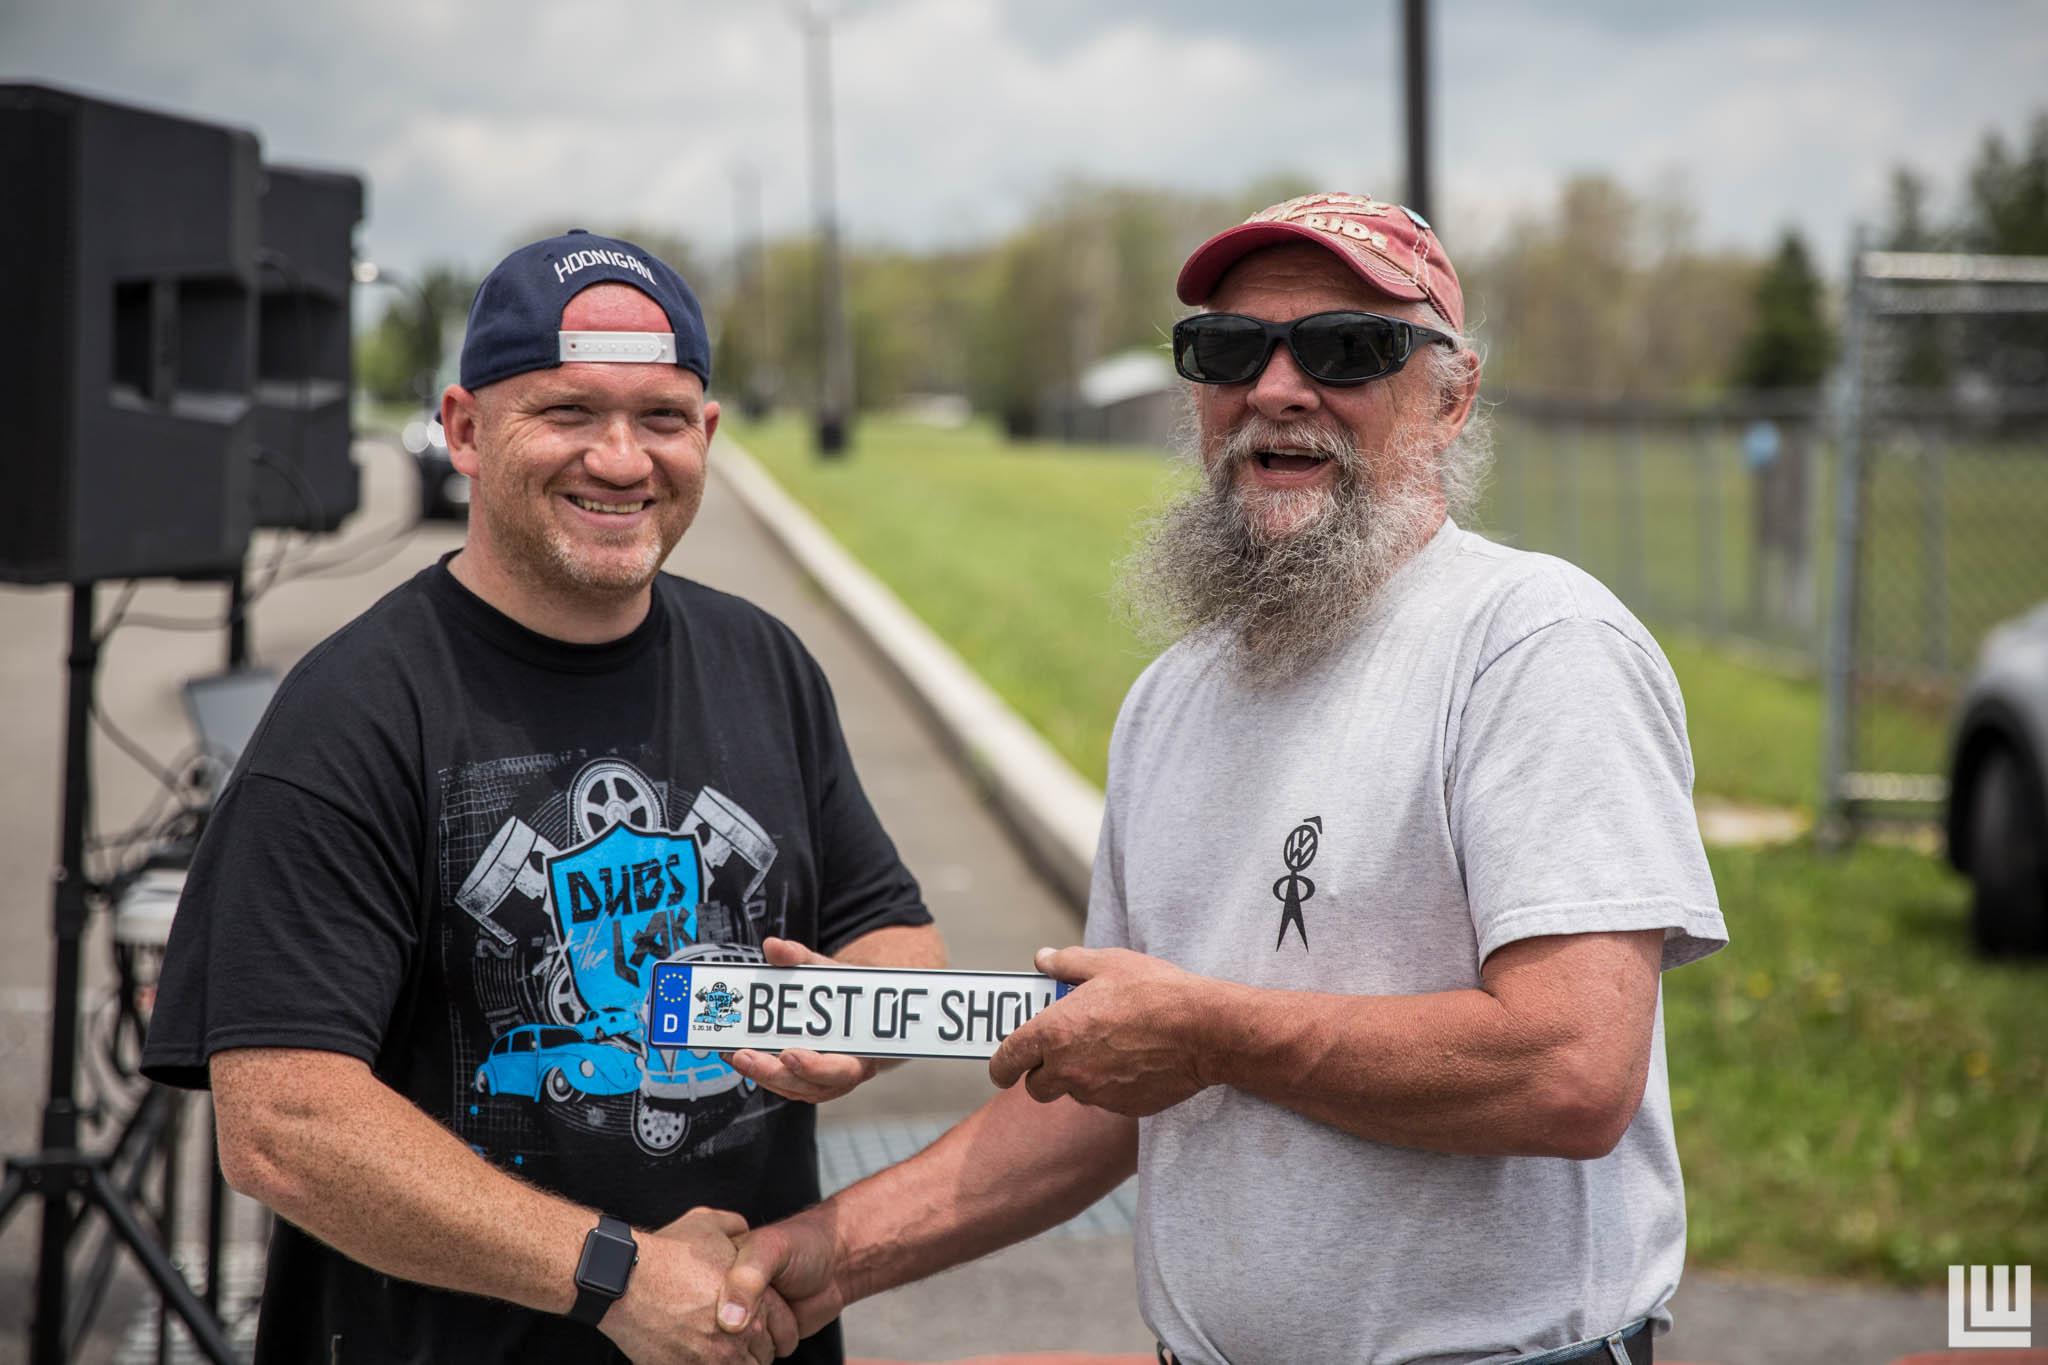 Pictured: Left;Jonathan Leyh (Event promoter).   Right; Alvin Ziminsky (Best of show winner)